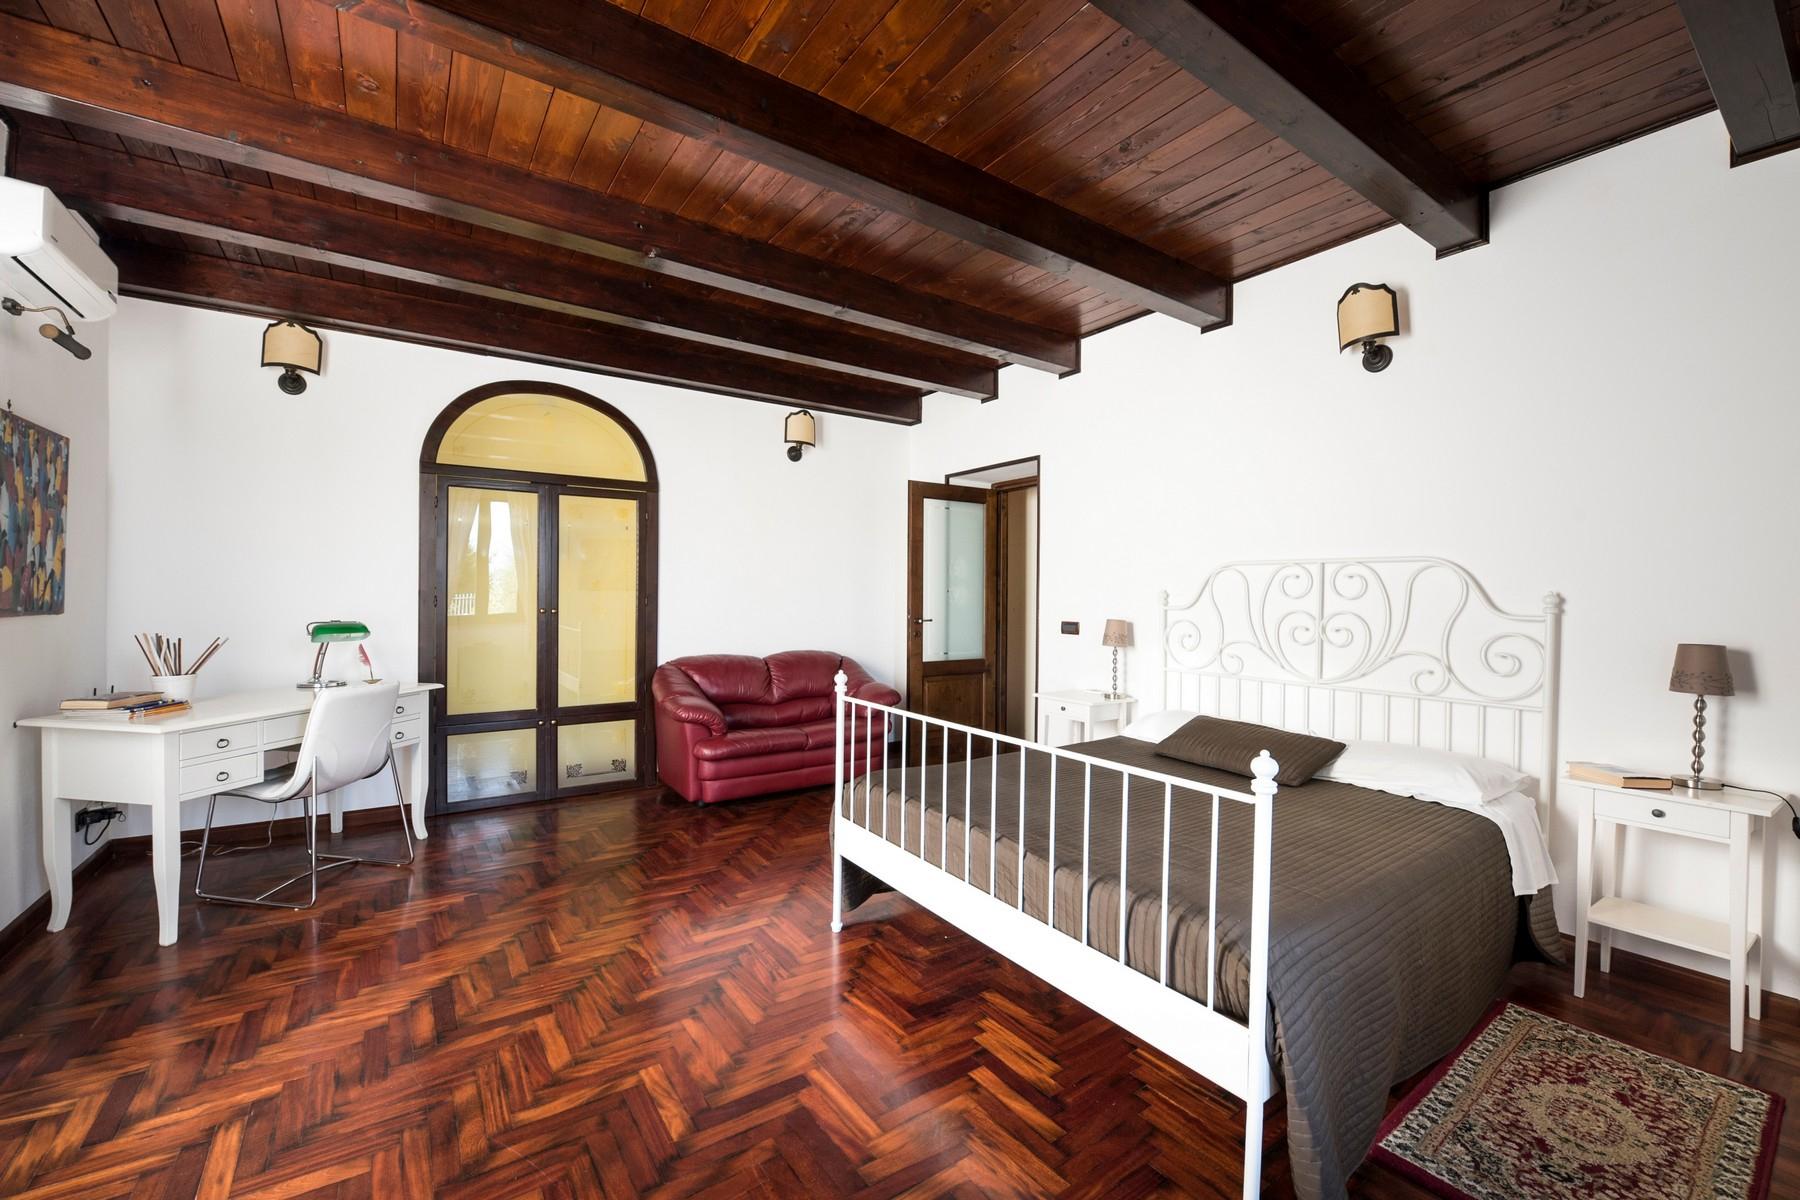 Casa indipendente in Vendita a Noto: 5 locali, 300 mq - Foto 19